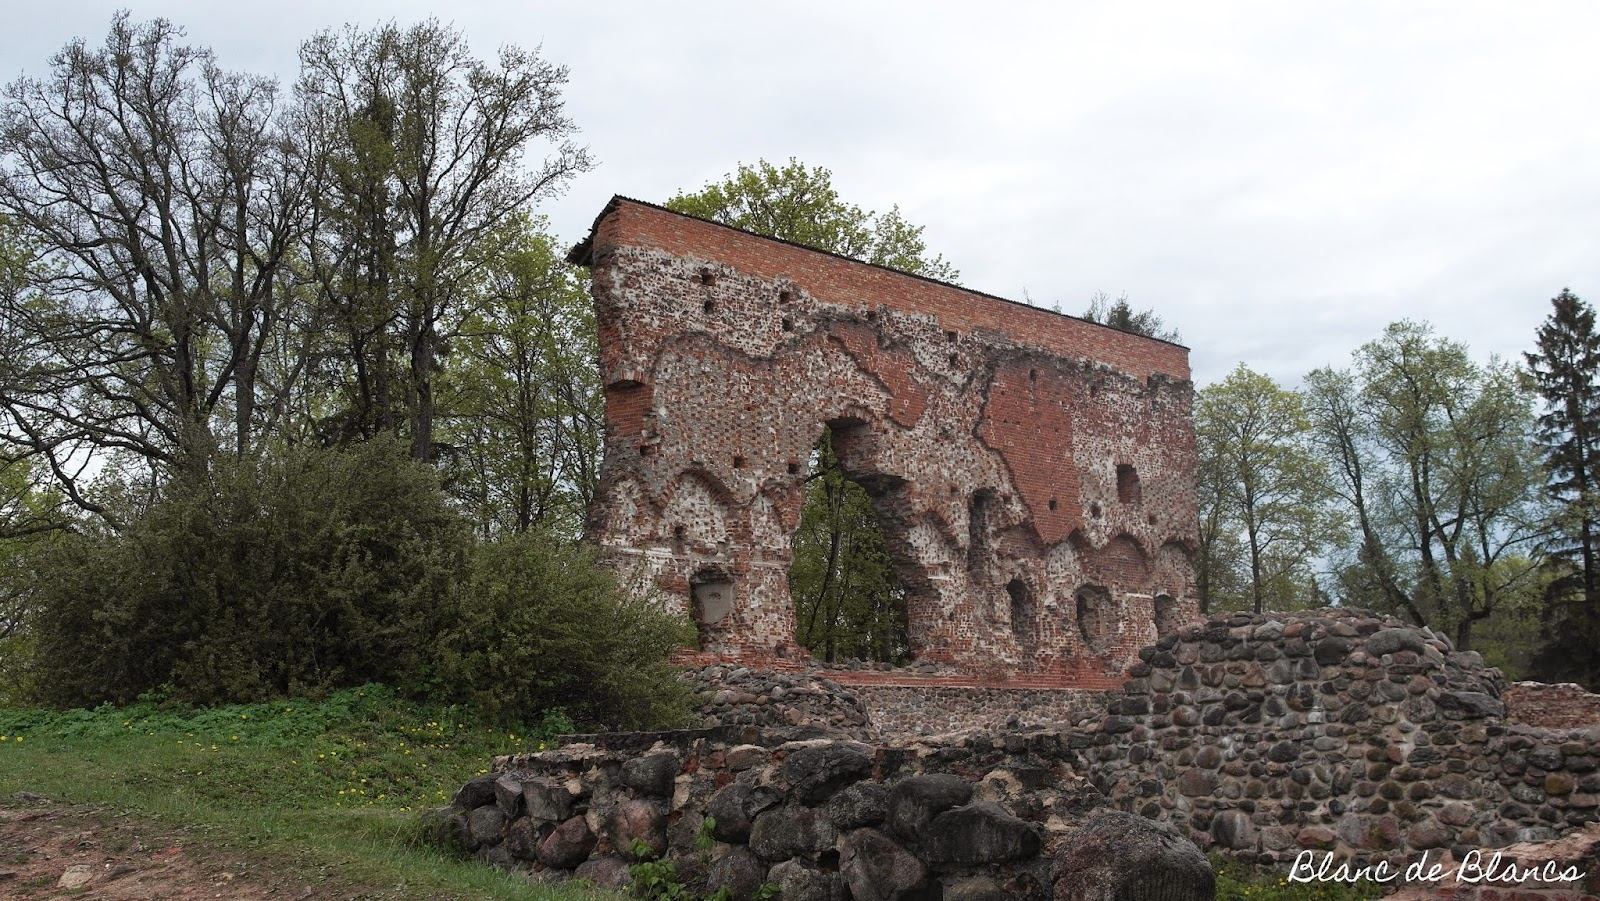 Viljandi linnanrauniot - www.blancdeblancs.fi